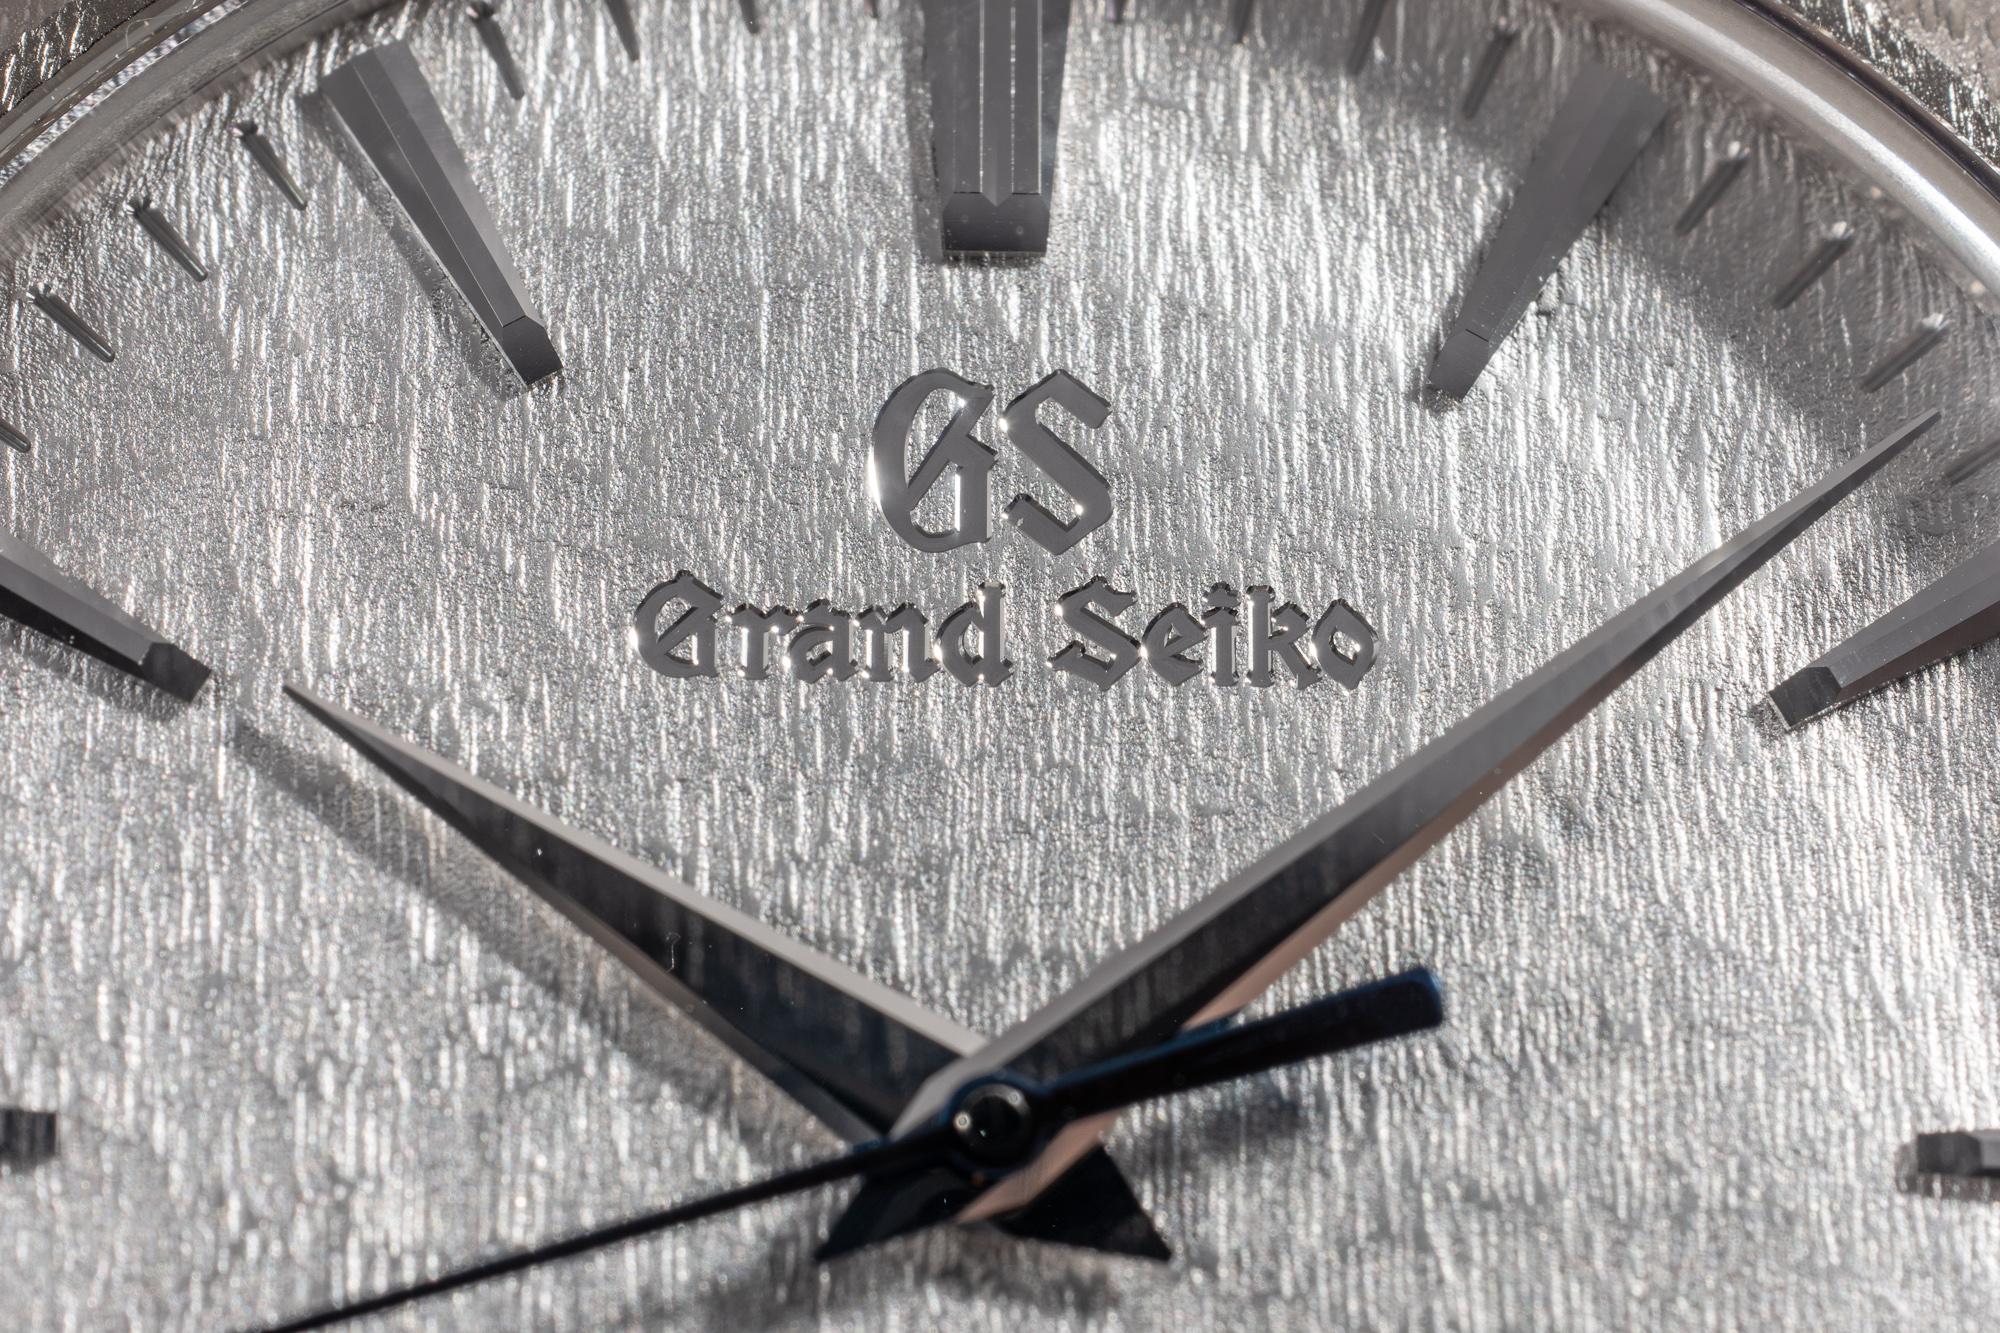 Grand_Seiko_9R02_Platinum_Spring_Drive_Detail.jpg